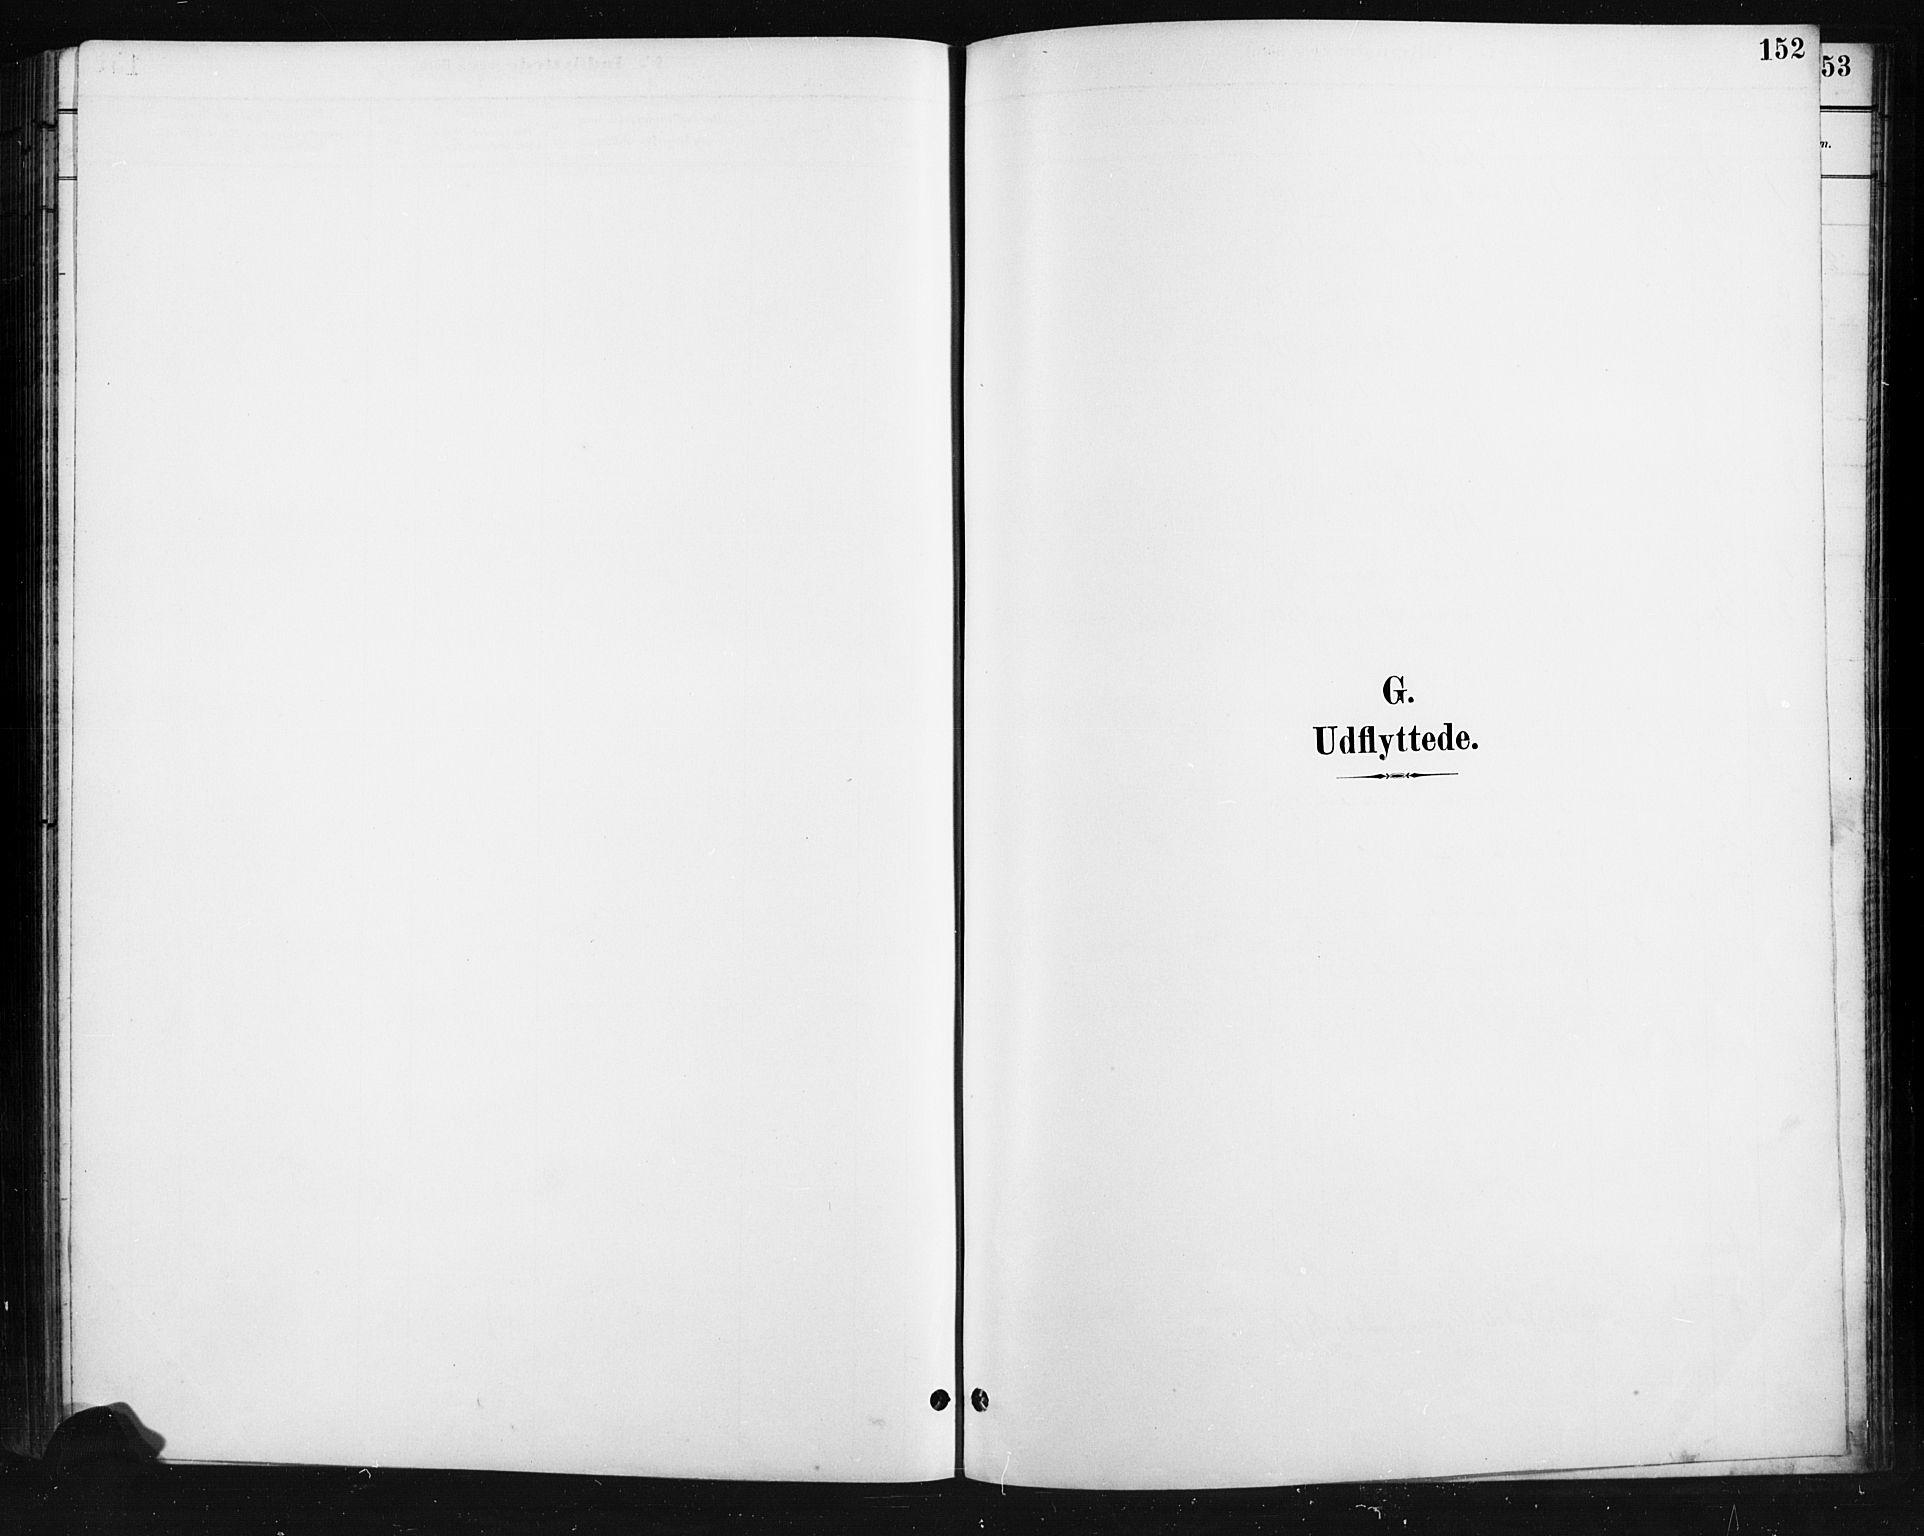 SAH, Skjåk prestekontor, Klokkerbok nr. 4, 1895-1921, s. 152